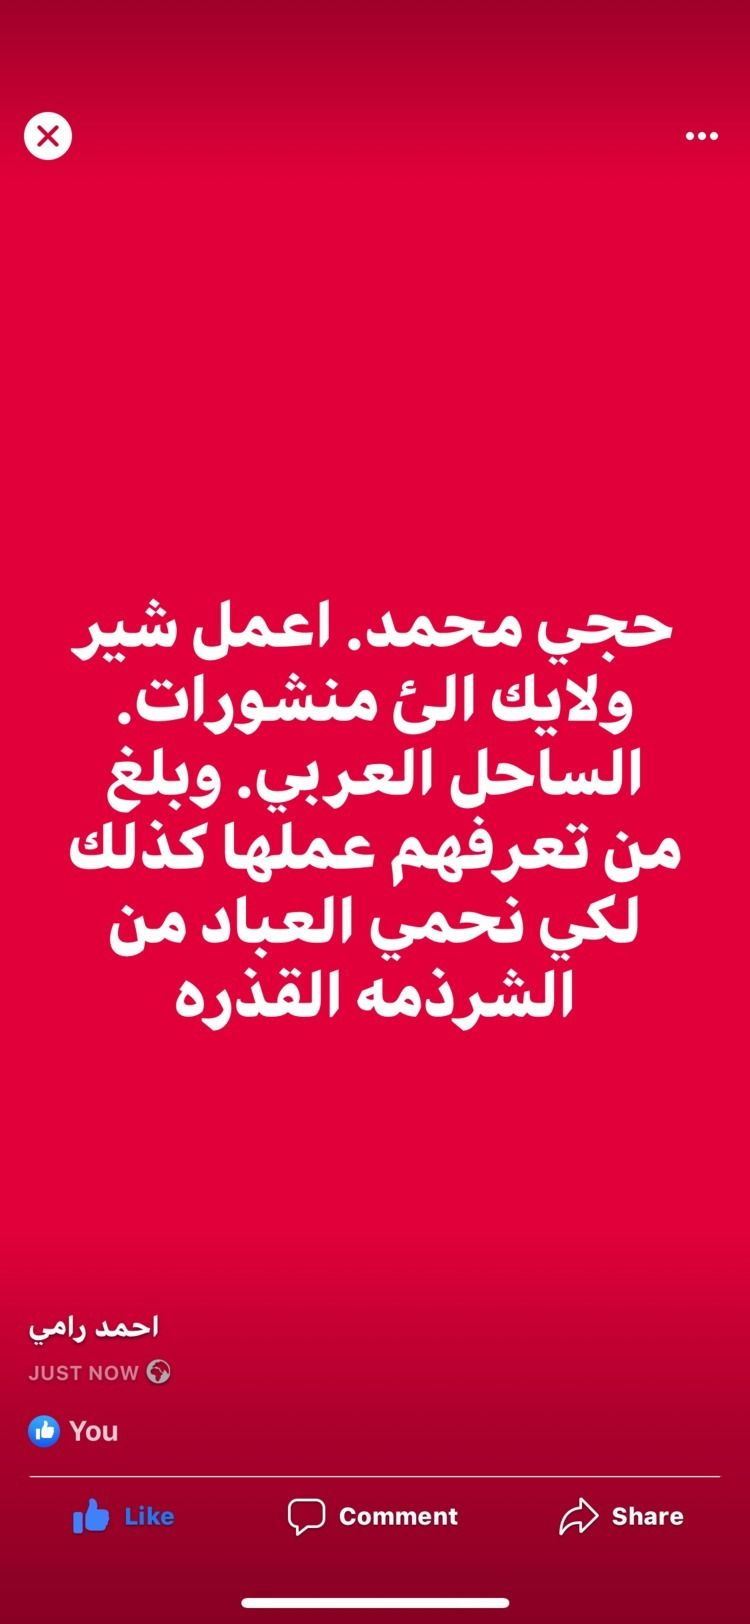 ahmedrami3 Post 26 Feb 2020 13:56:54 UTC   ello